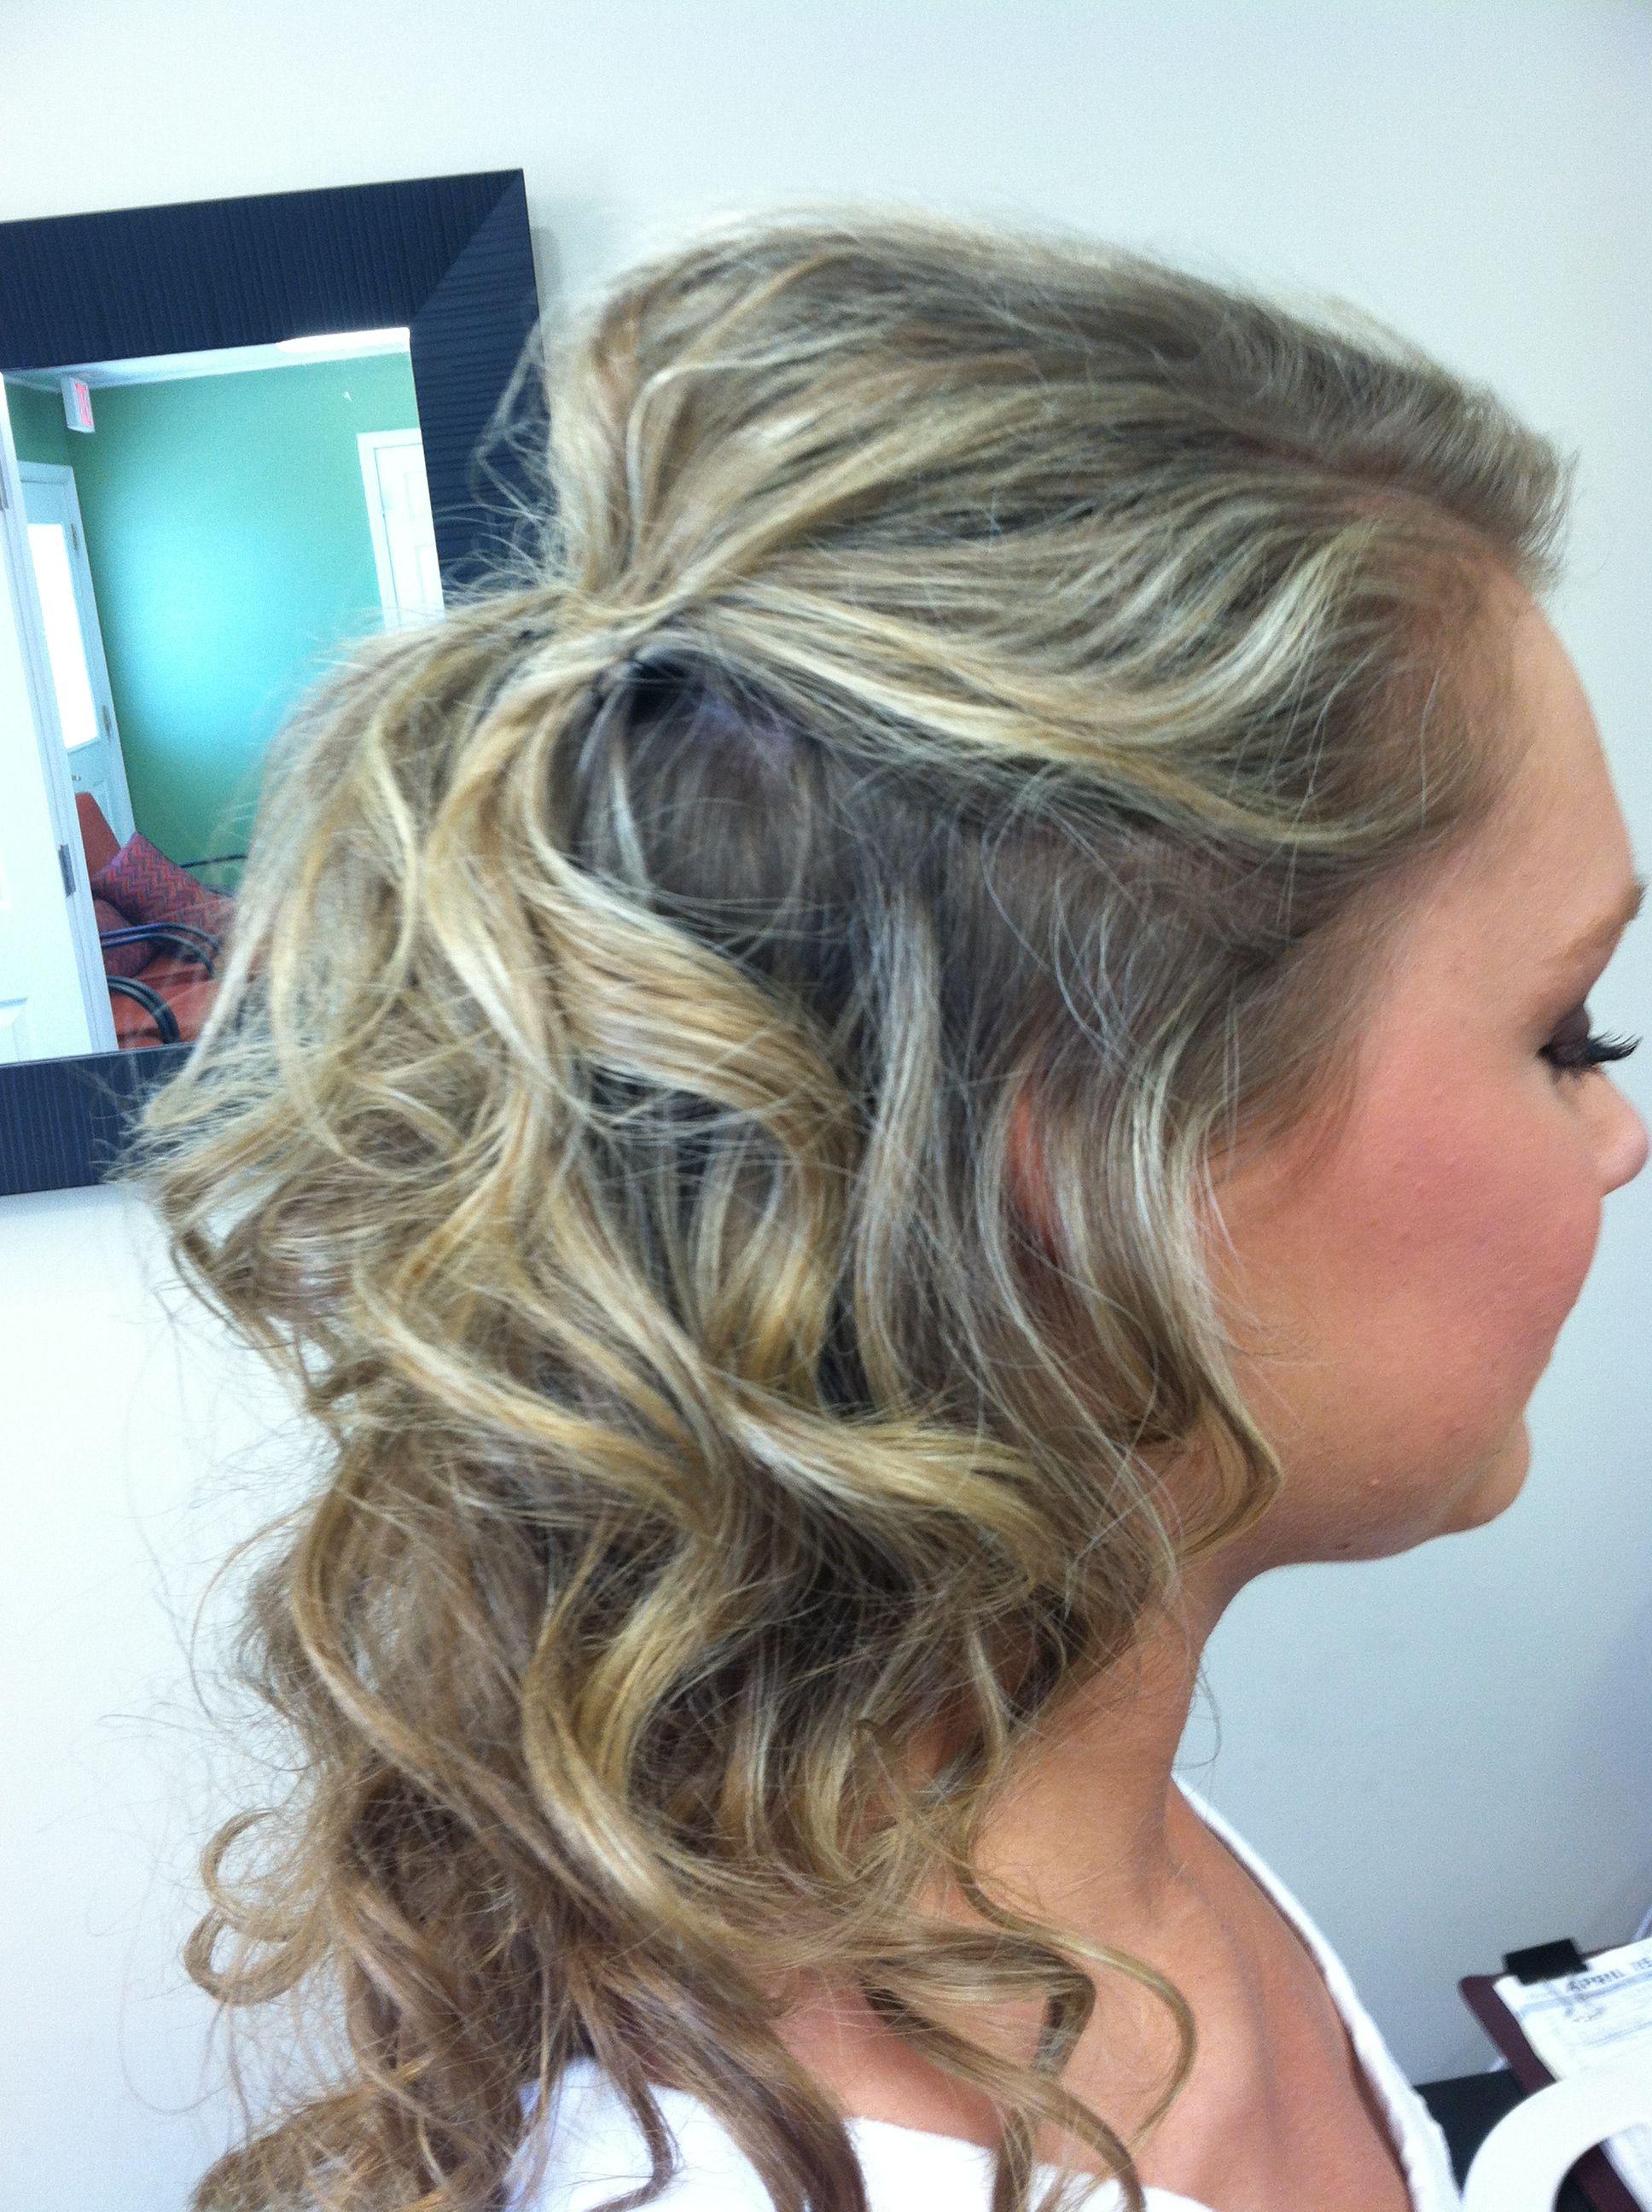 Prom hair | Hair, Hair styles, Prom hair